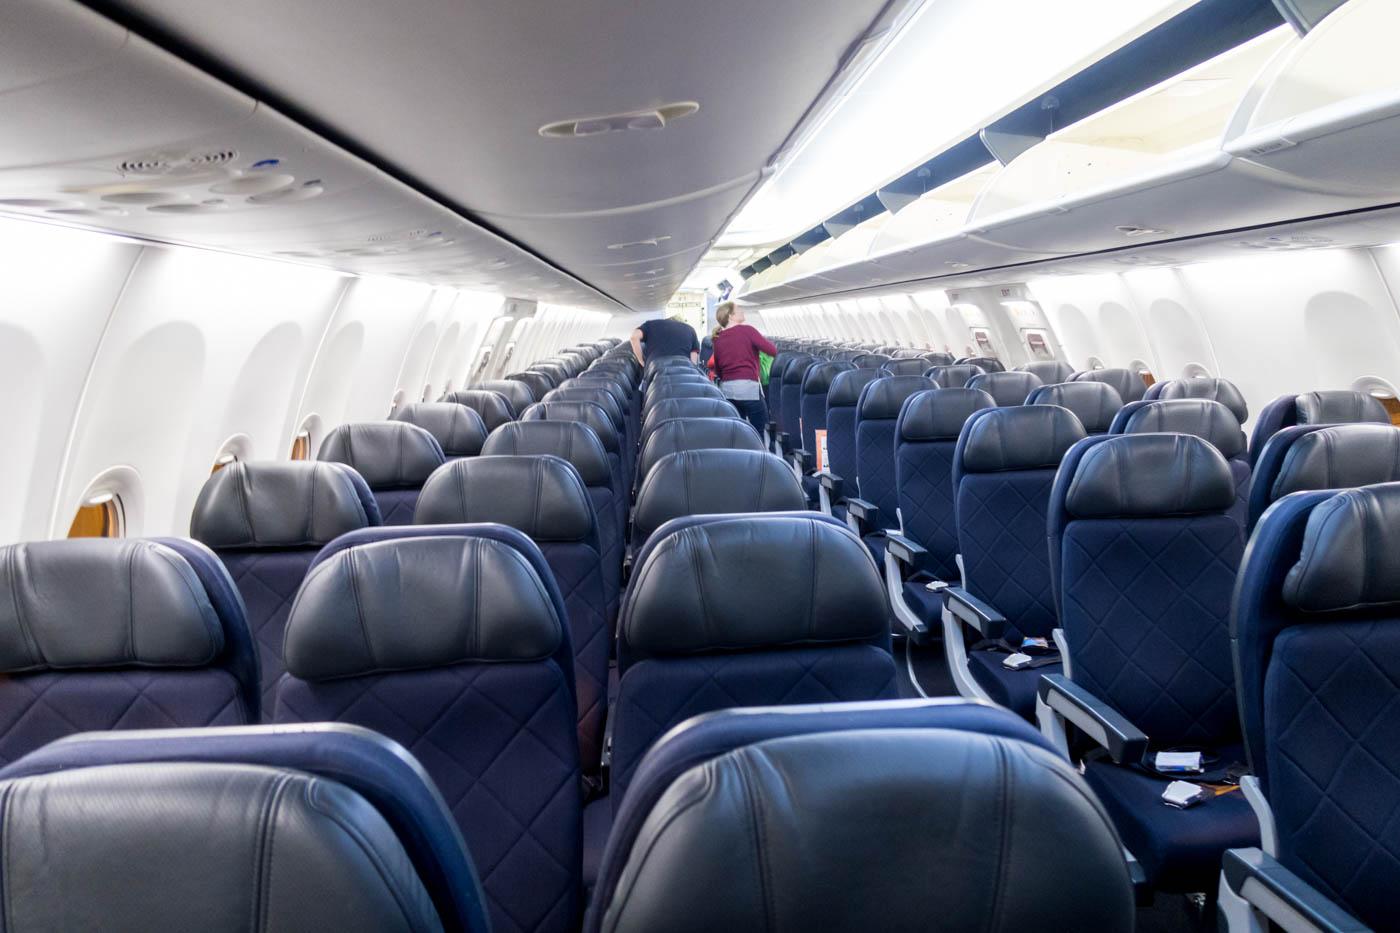 Qantas Boeing 737-800 Economy Class Cabin